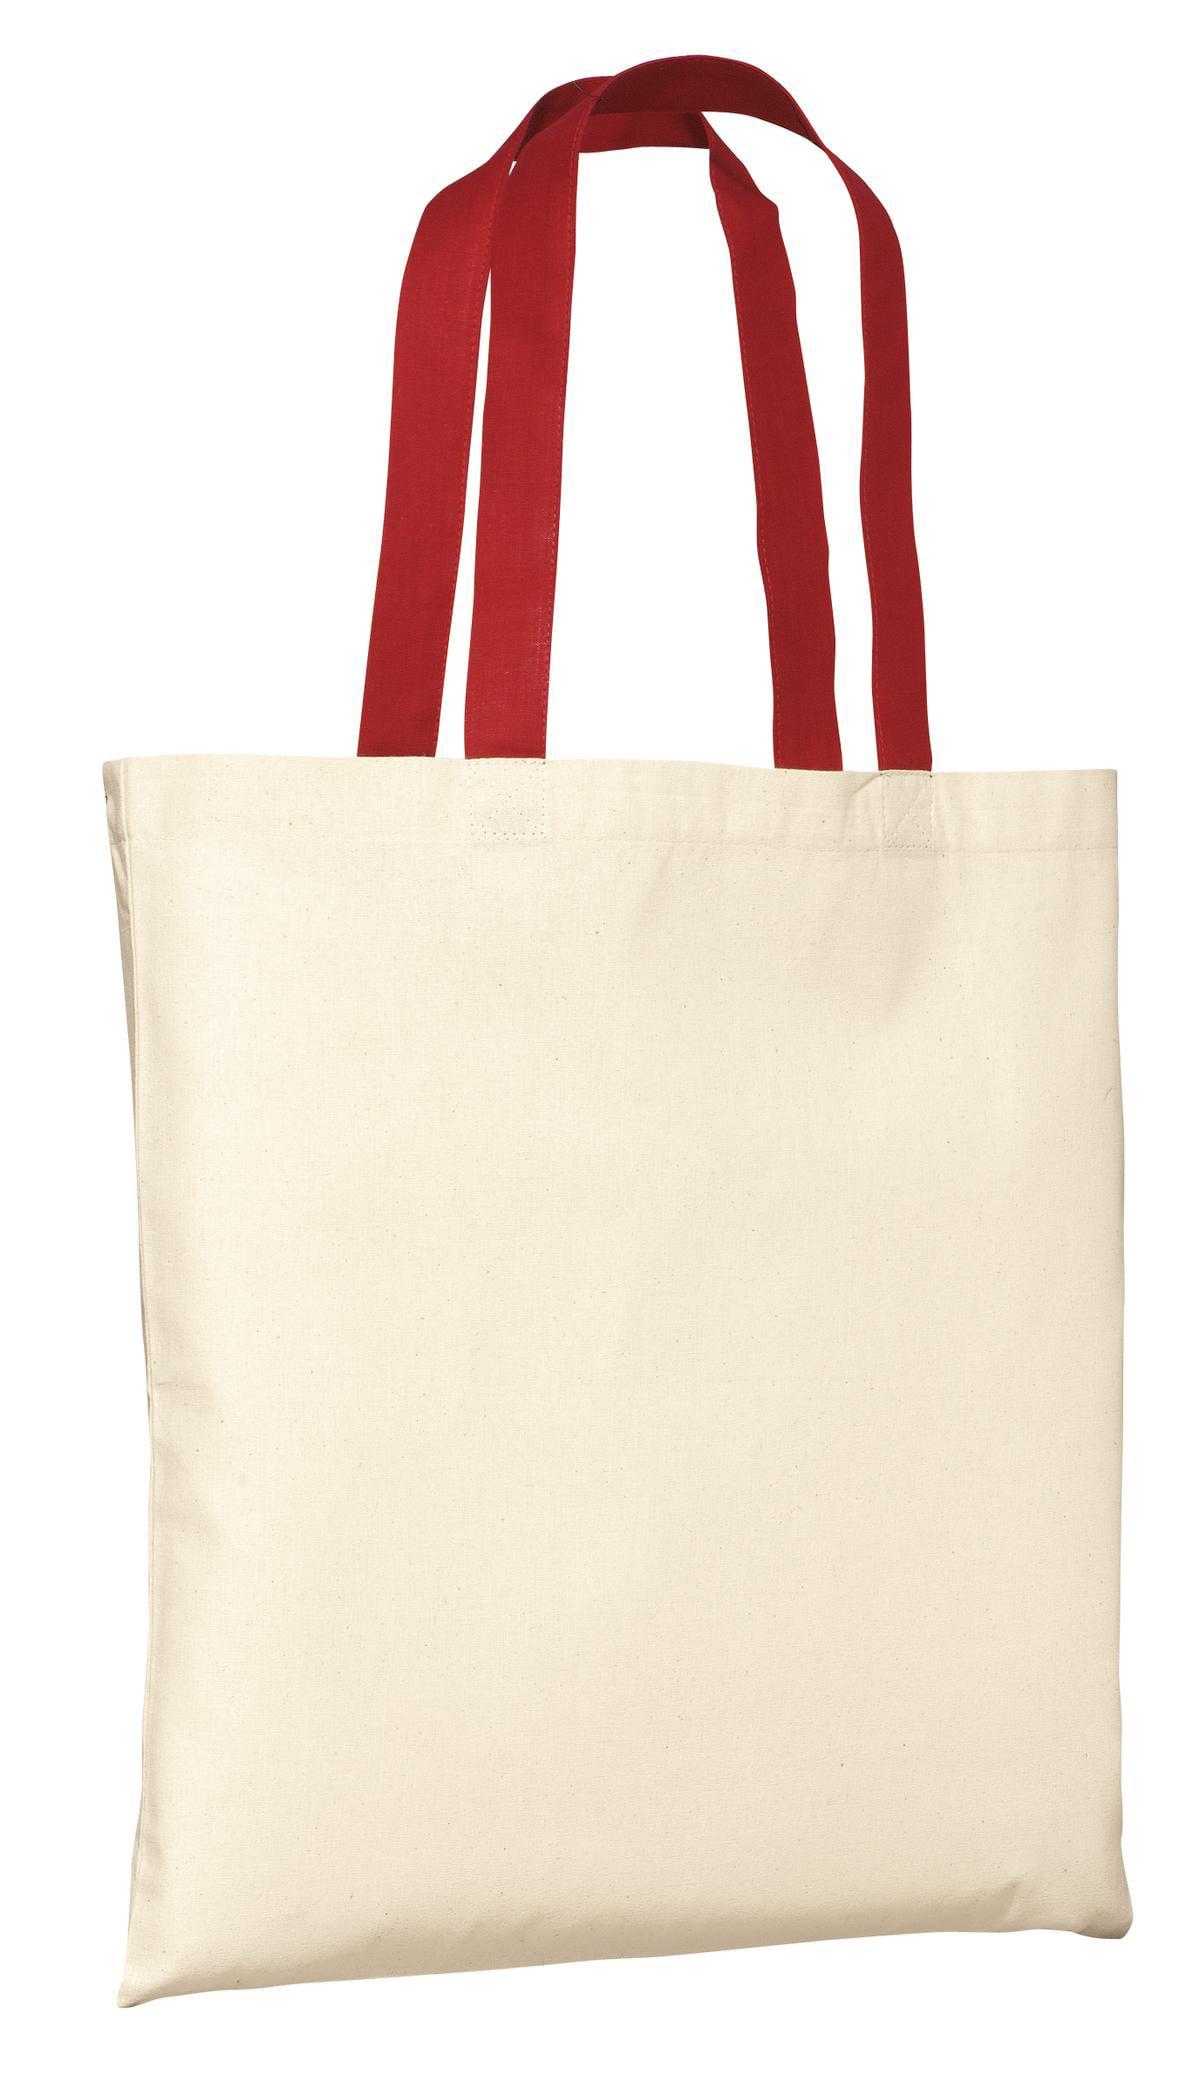 fd2e5334b818 Port   Company - Port   Company Stitching Handles Budget Tote Bag -  Walmart.com